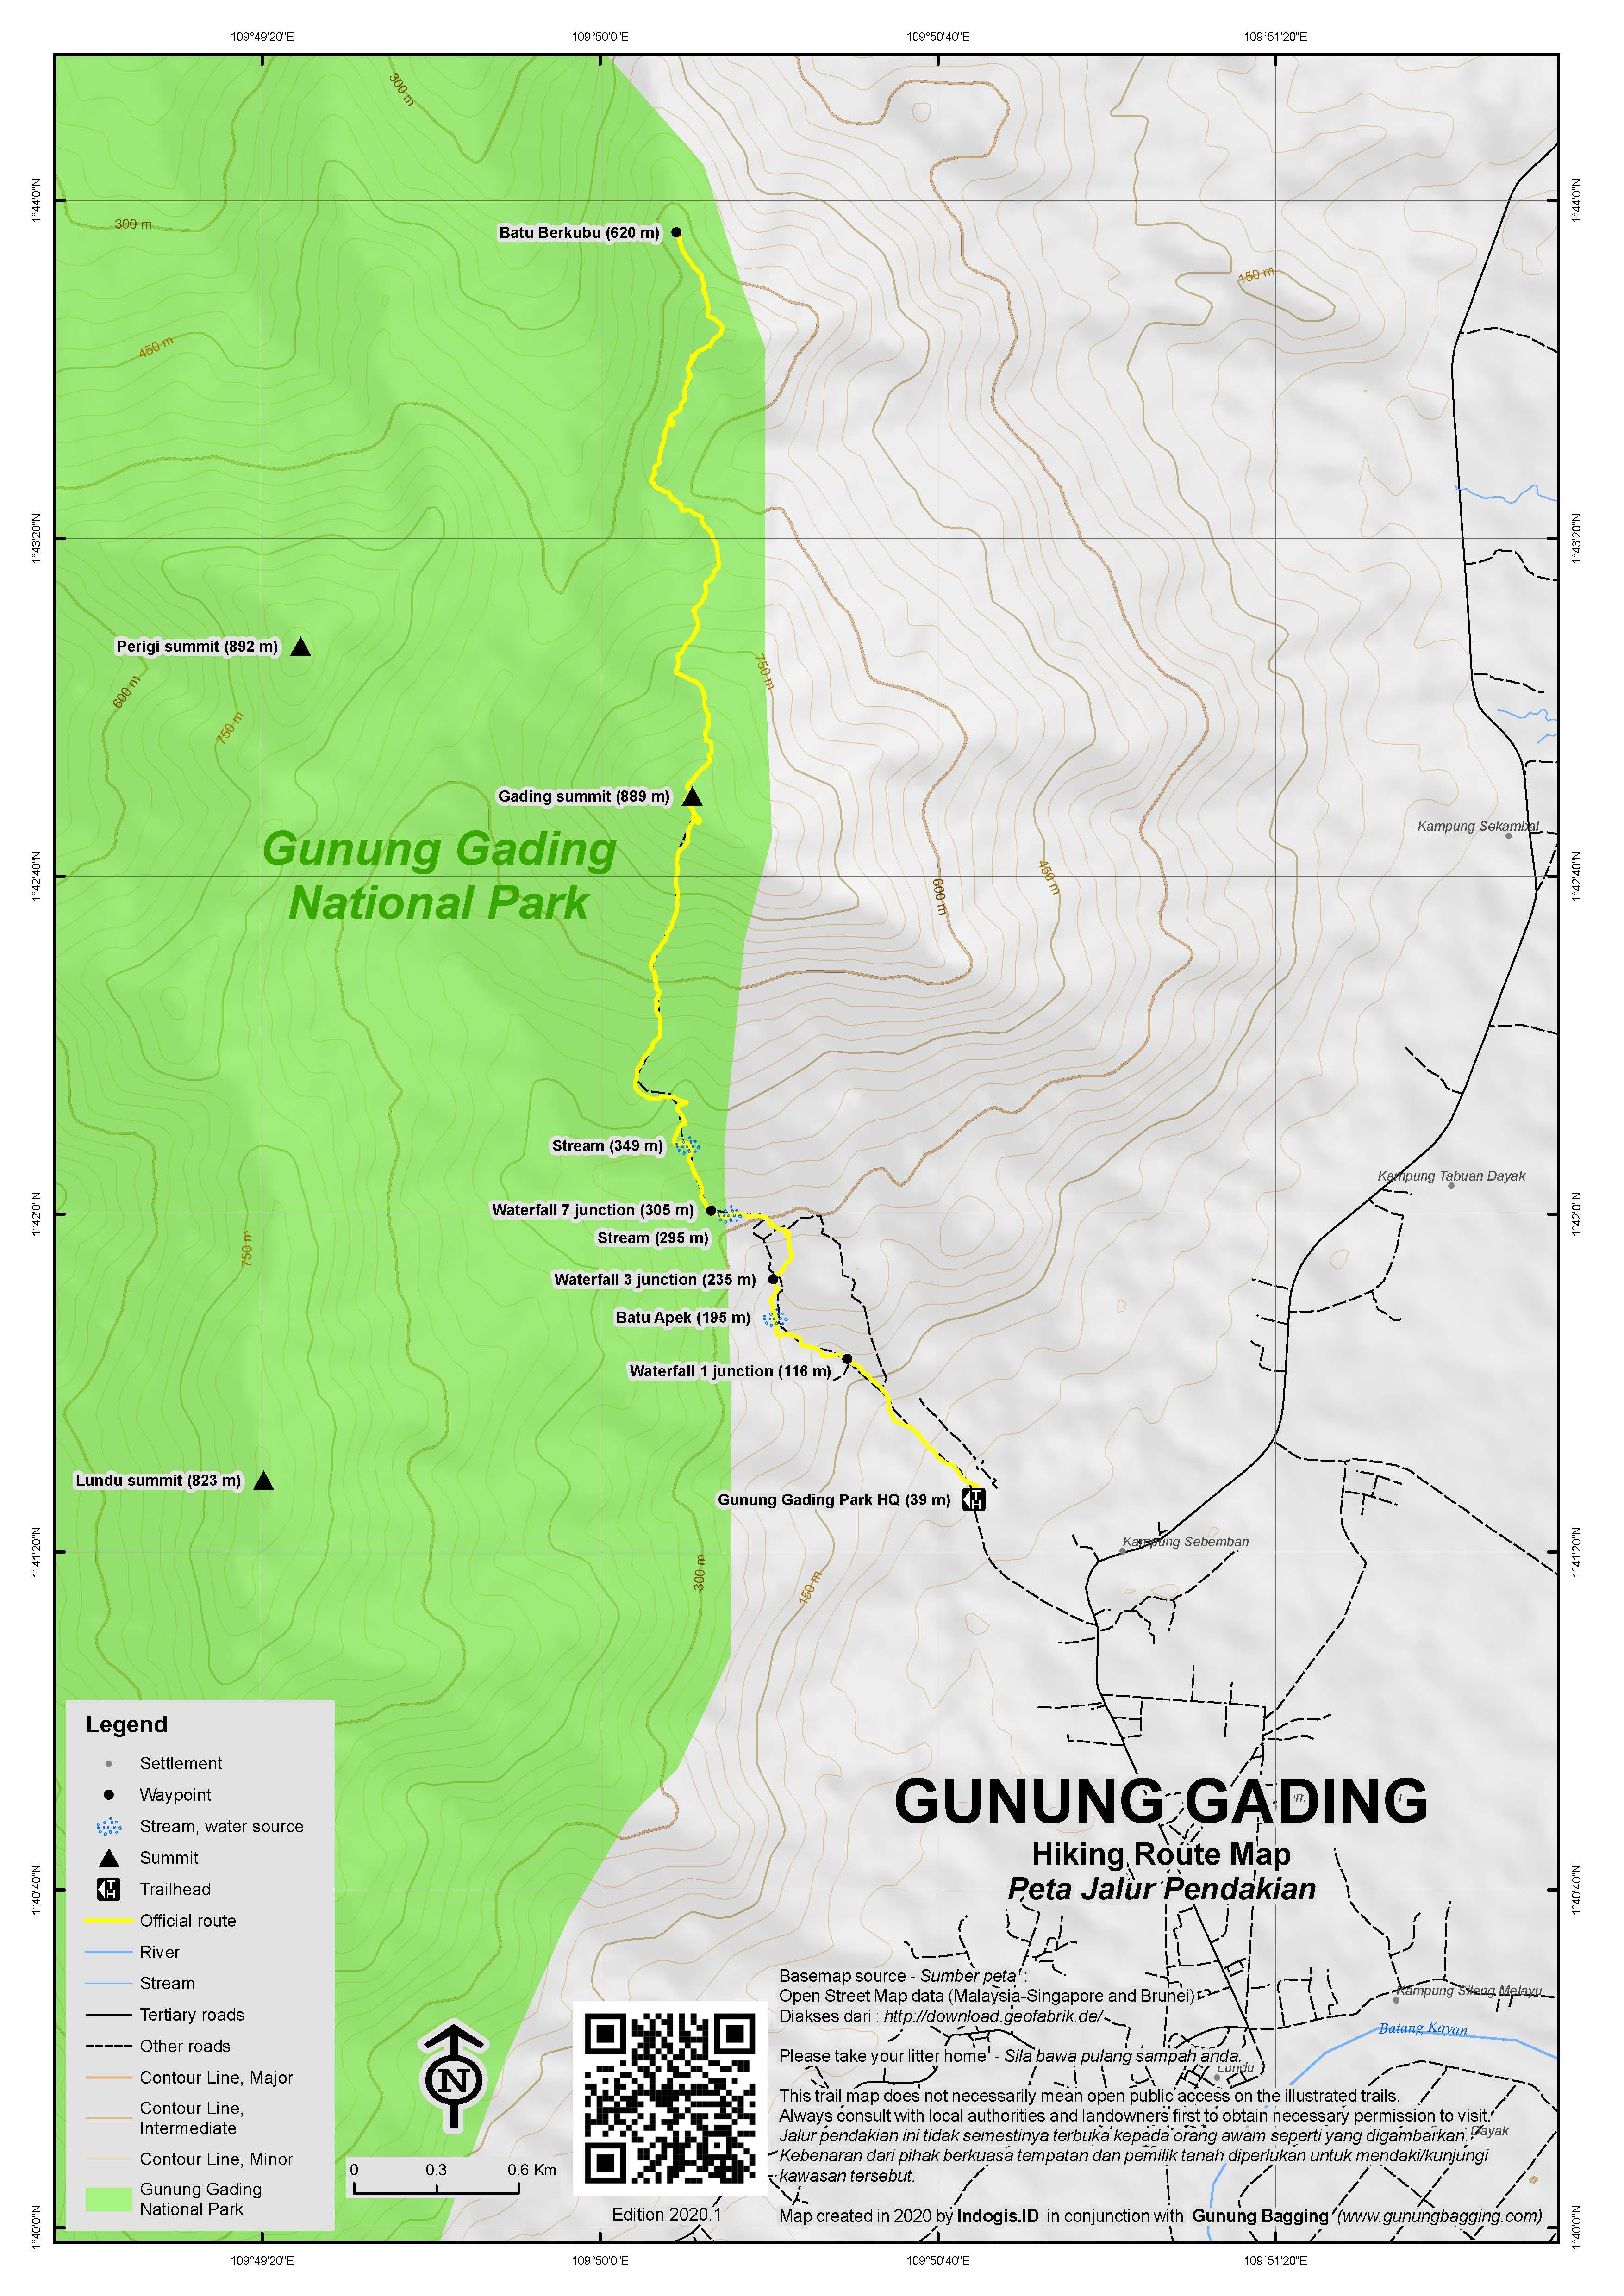 Peta Jalur Pendakian Gunung Gading